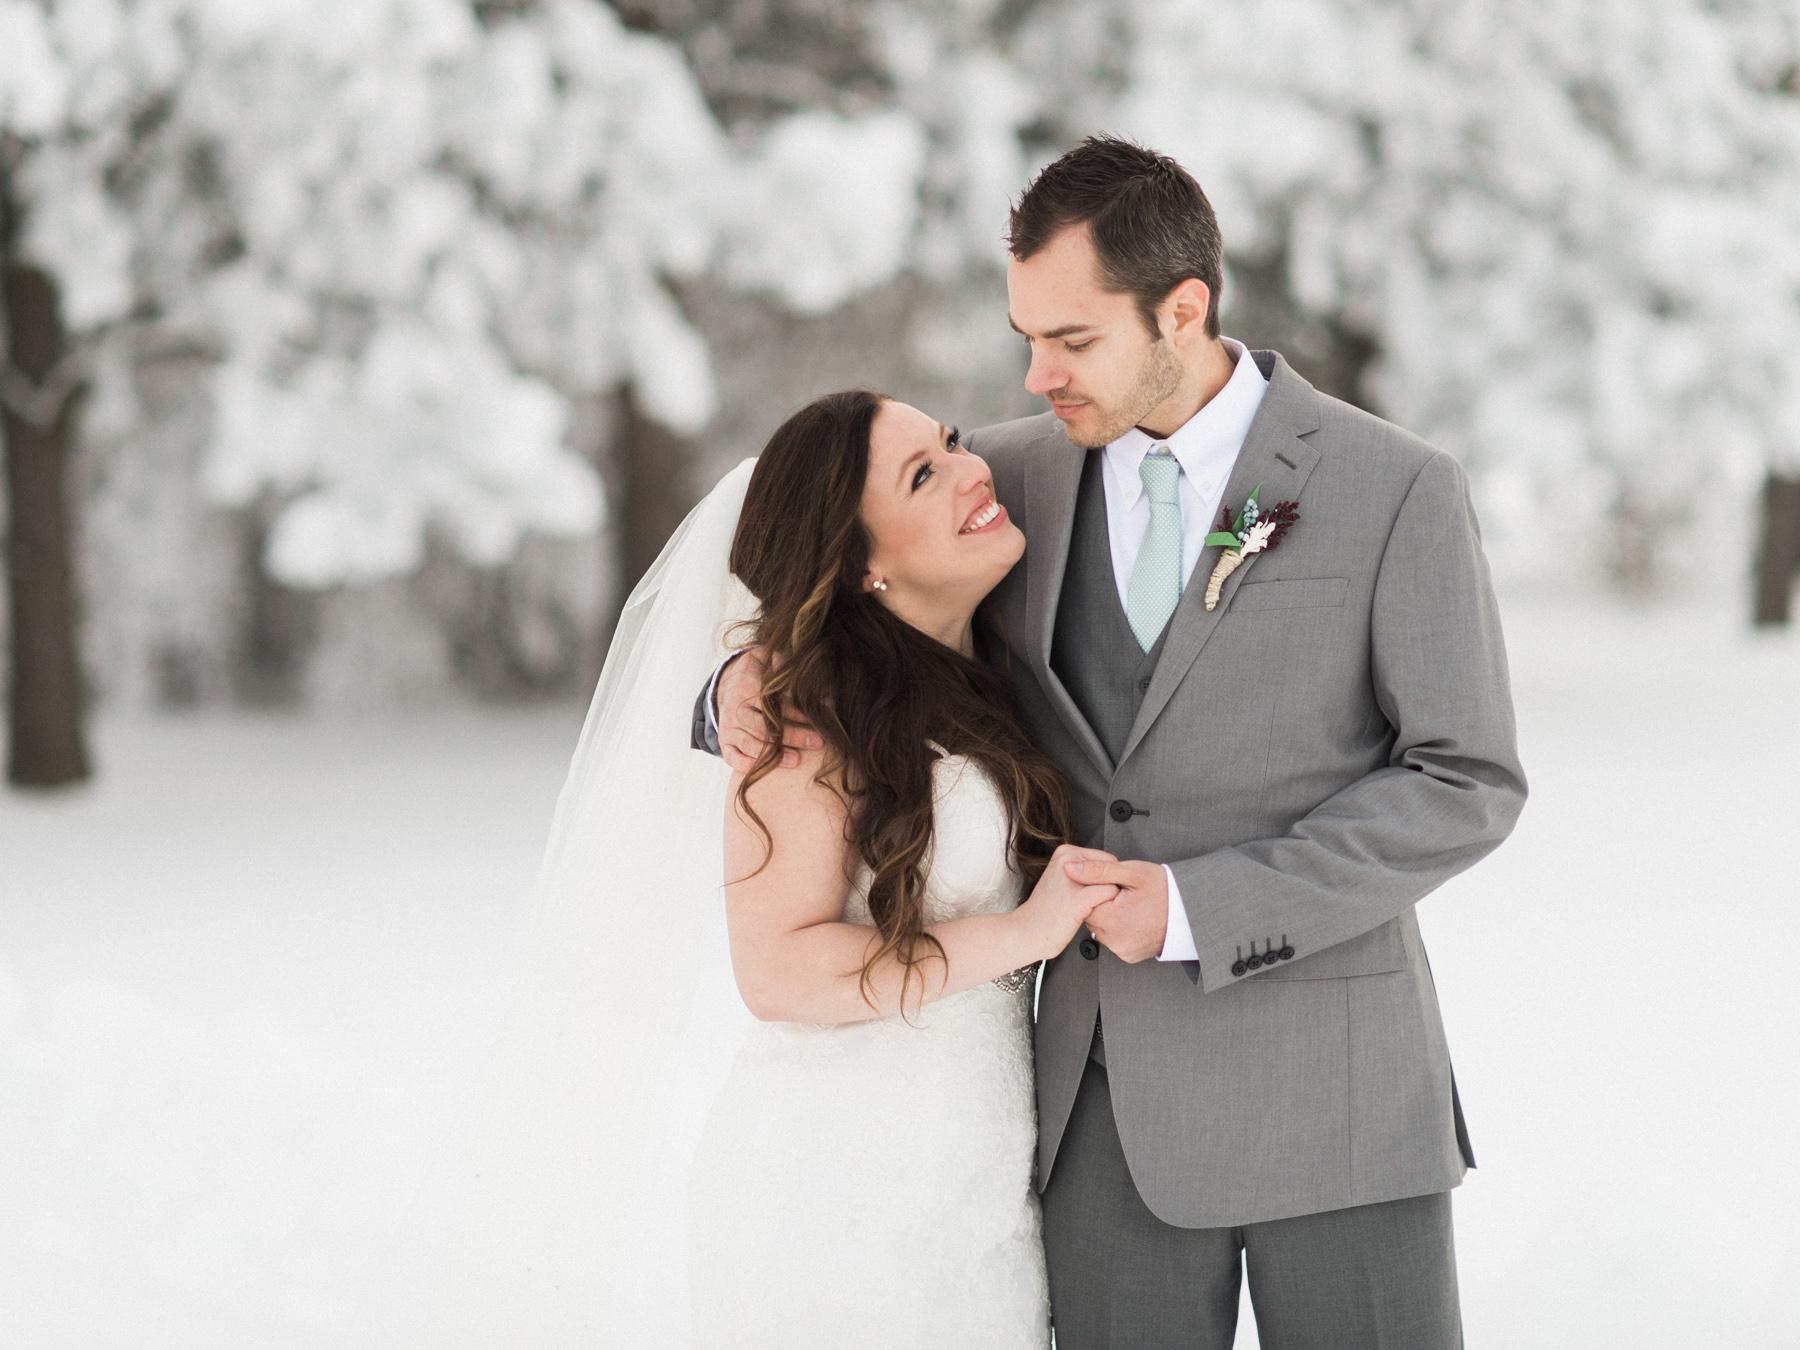 Ben+Joella | Jacob+Alana Wedding18.jpg